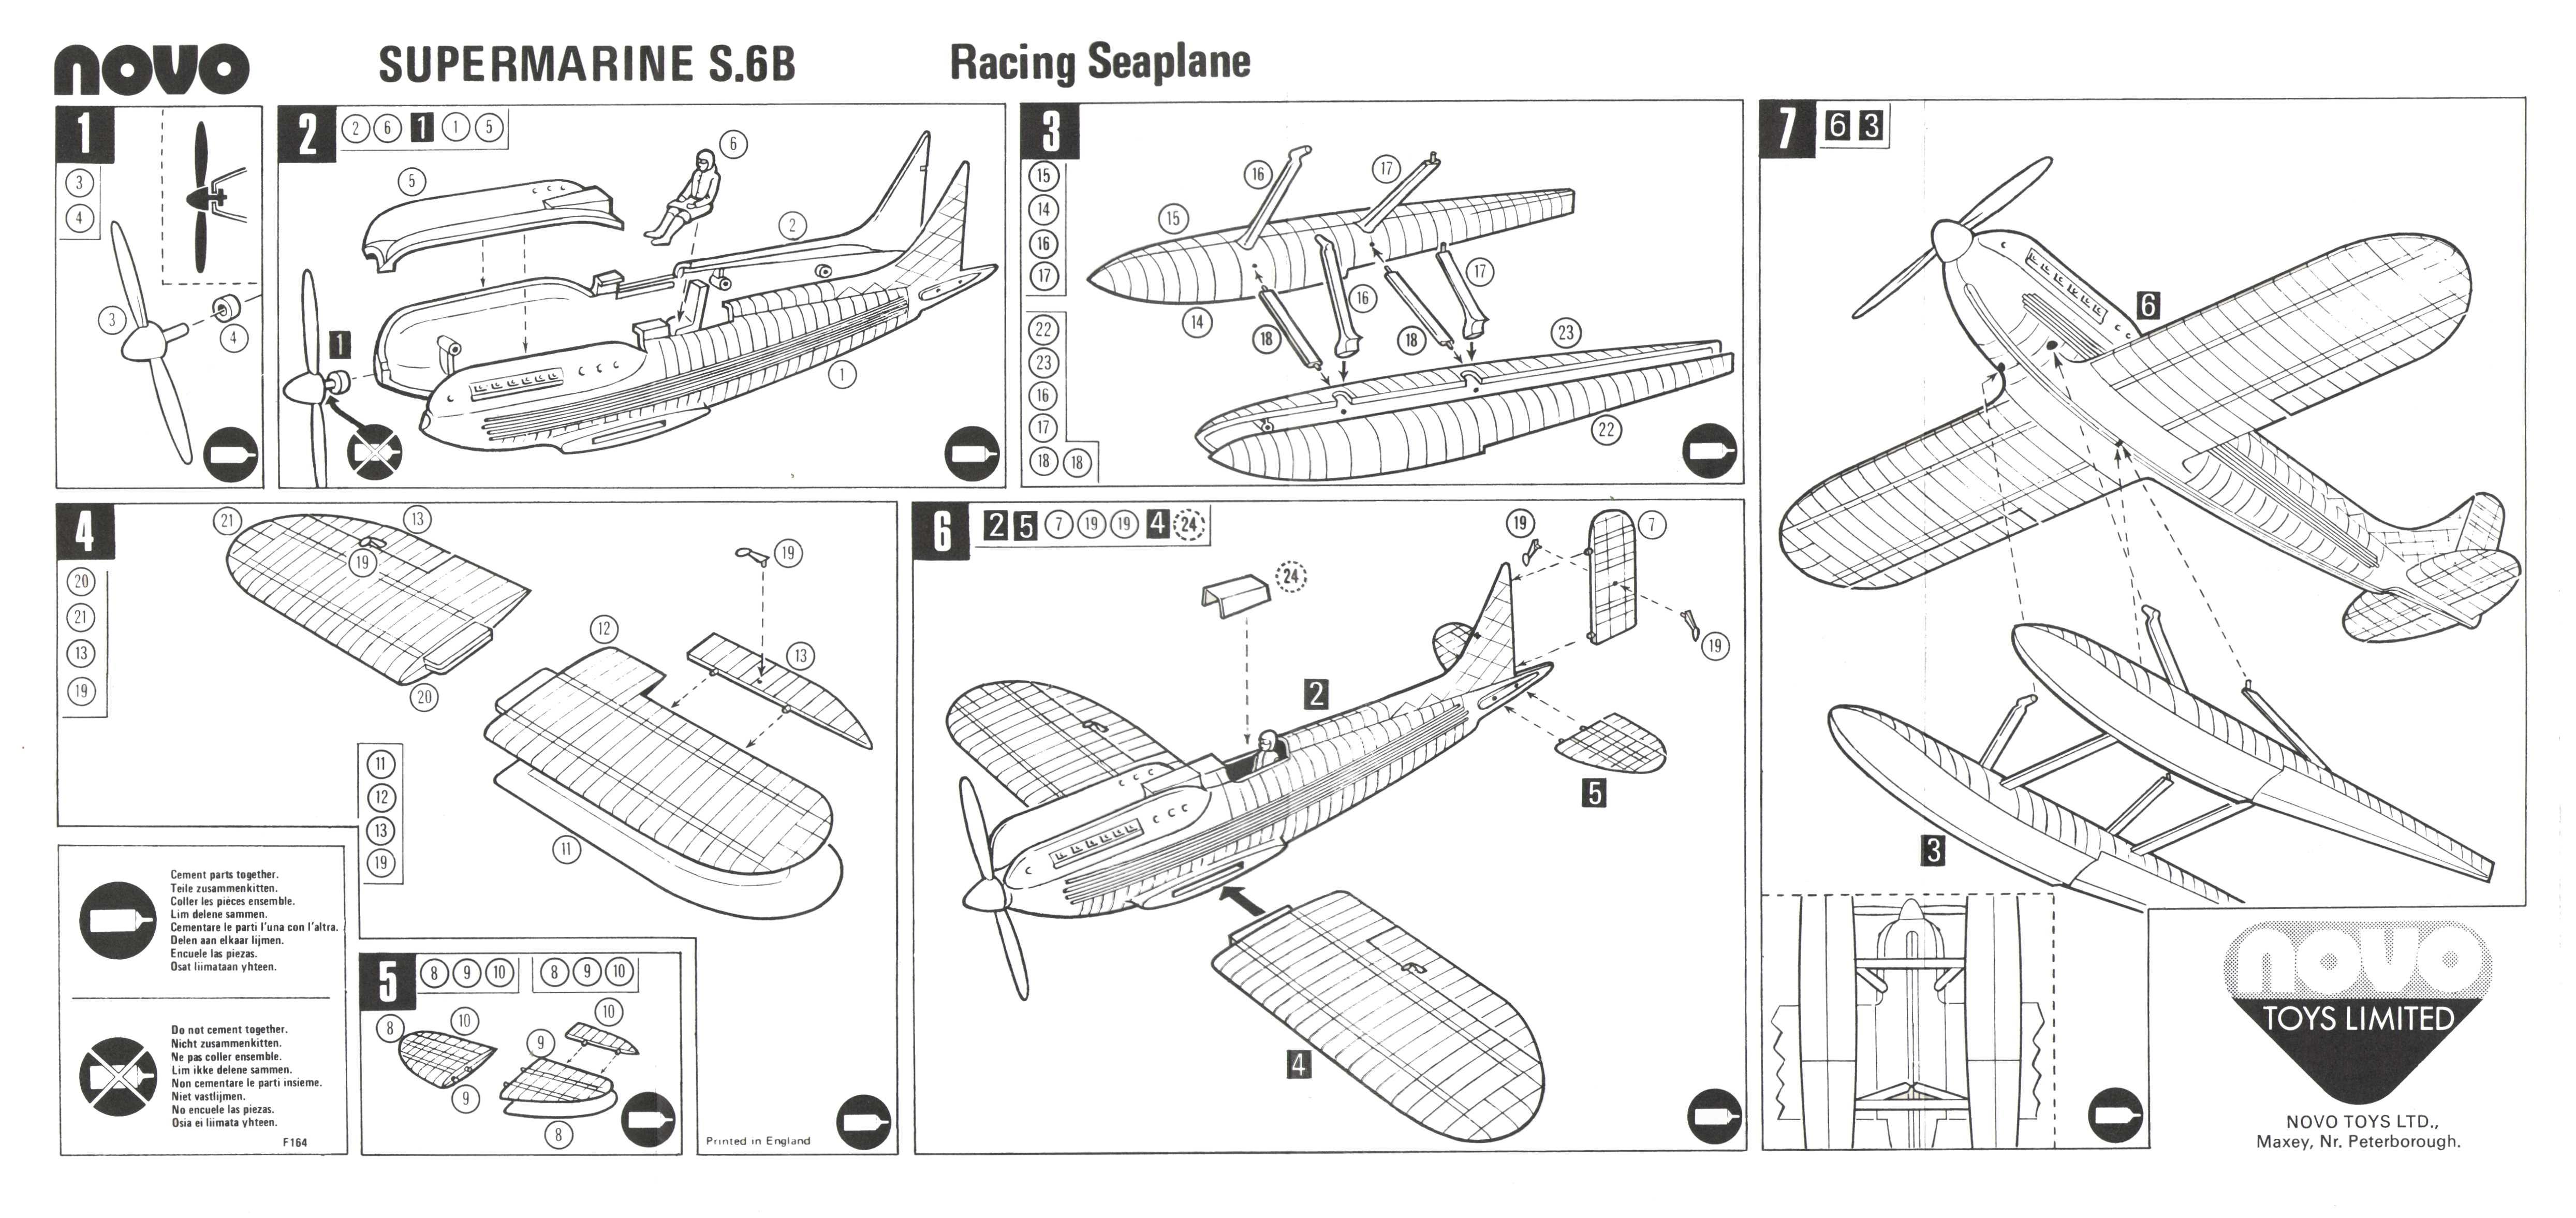 Инструкция по сборке NOVO Toys Ltd F164 Supermarine S.6B